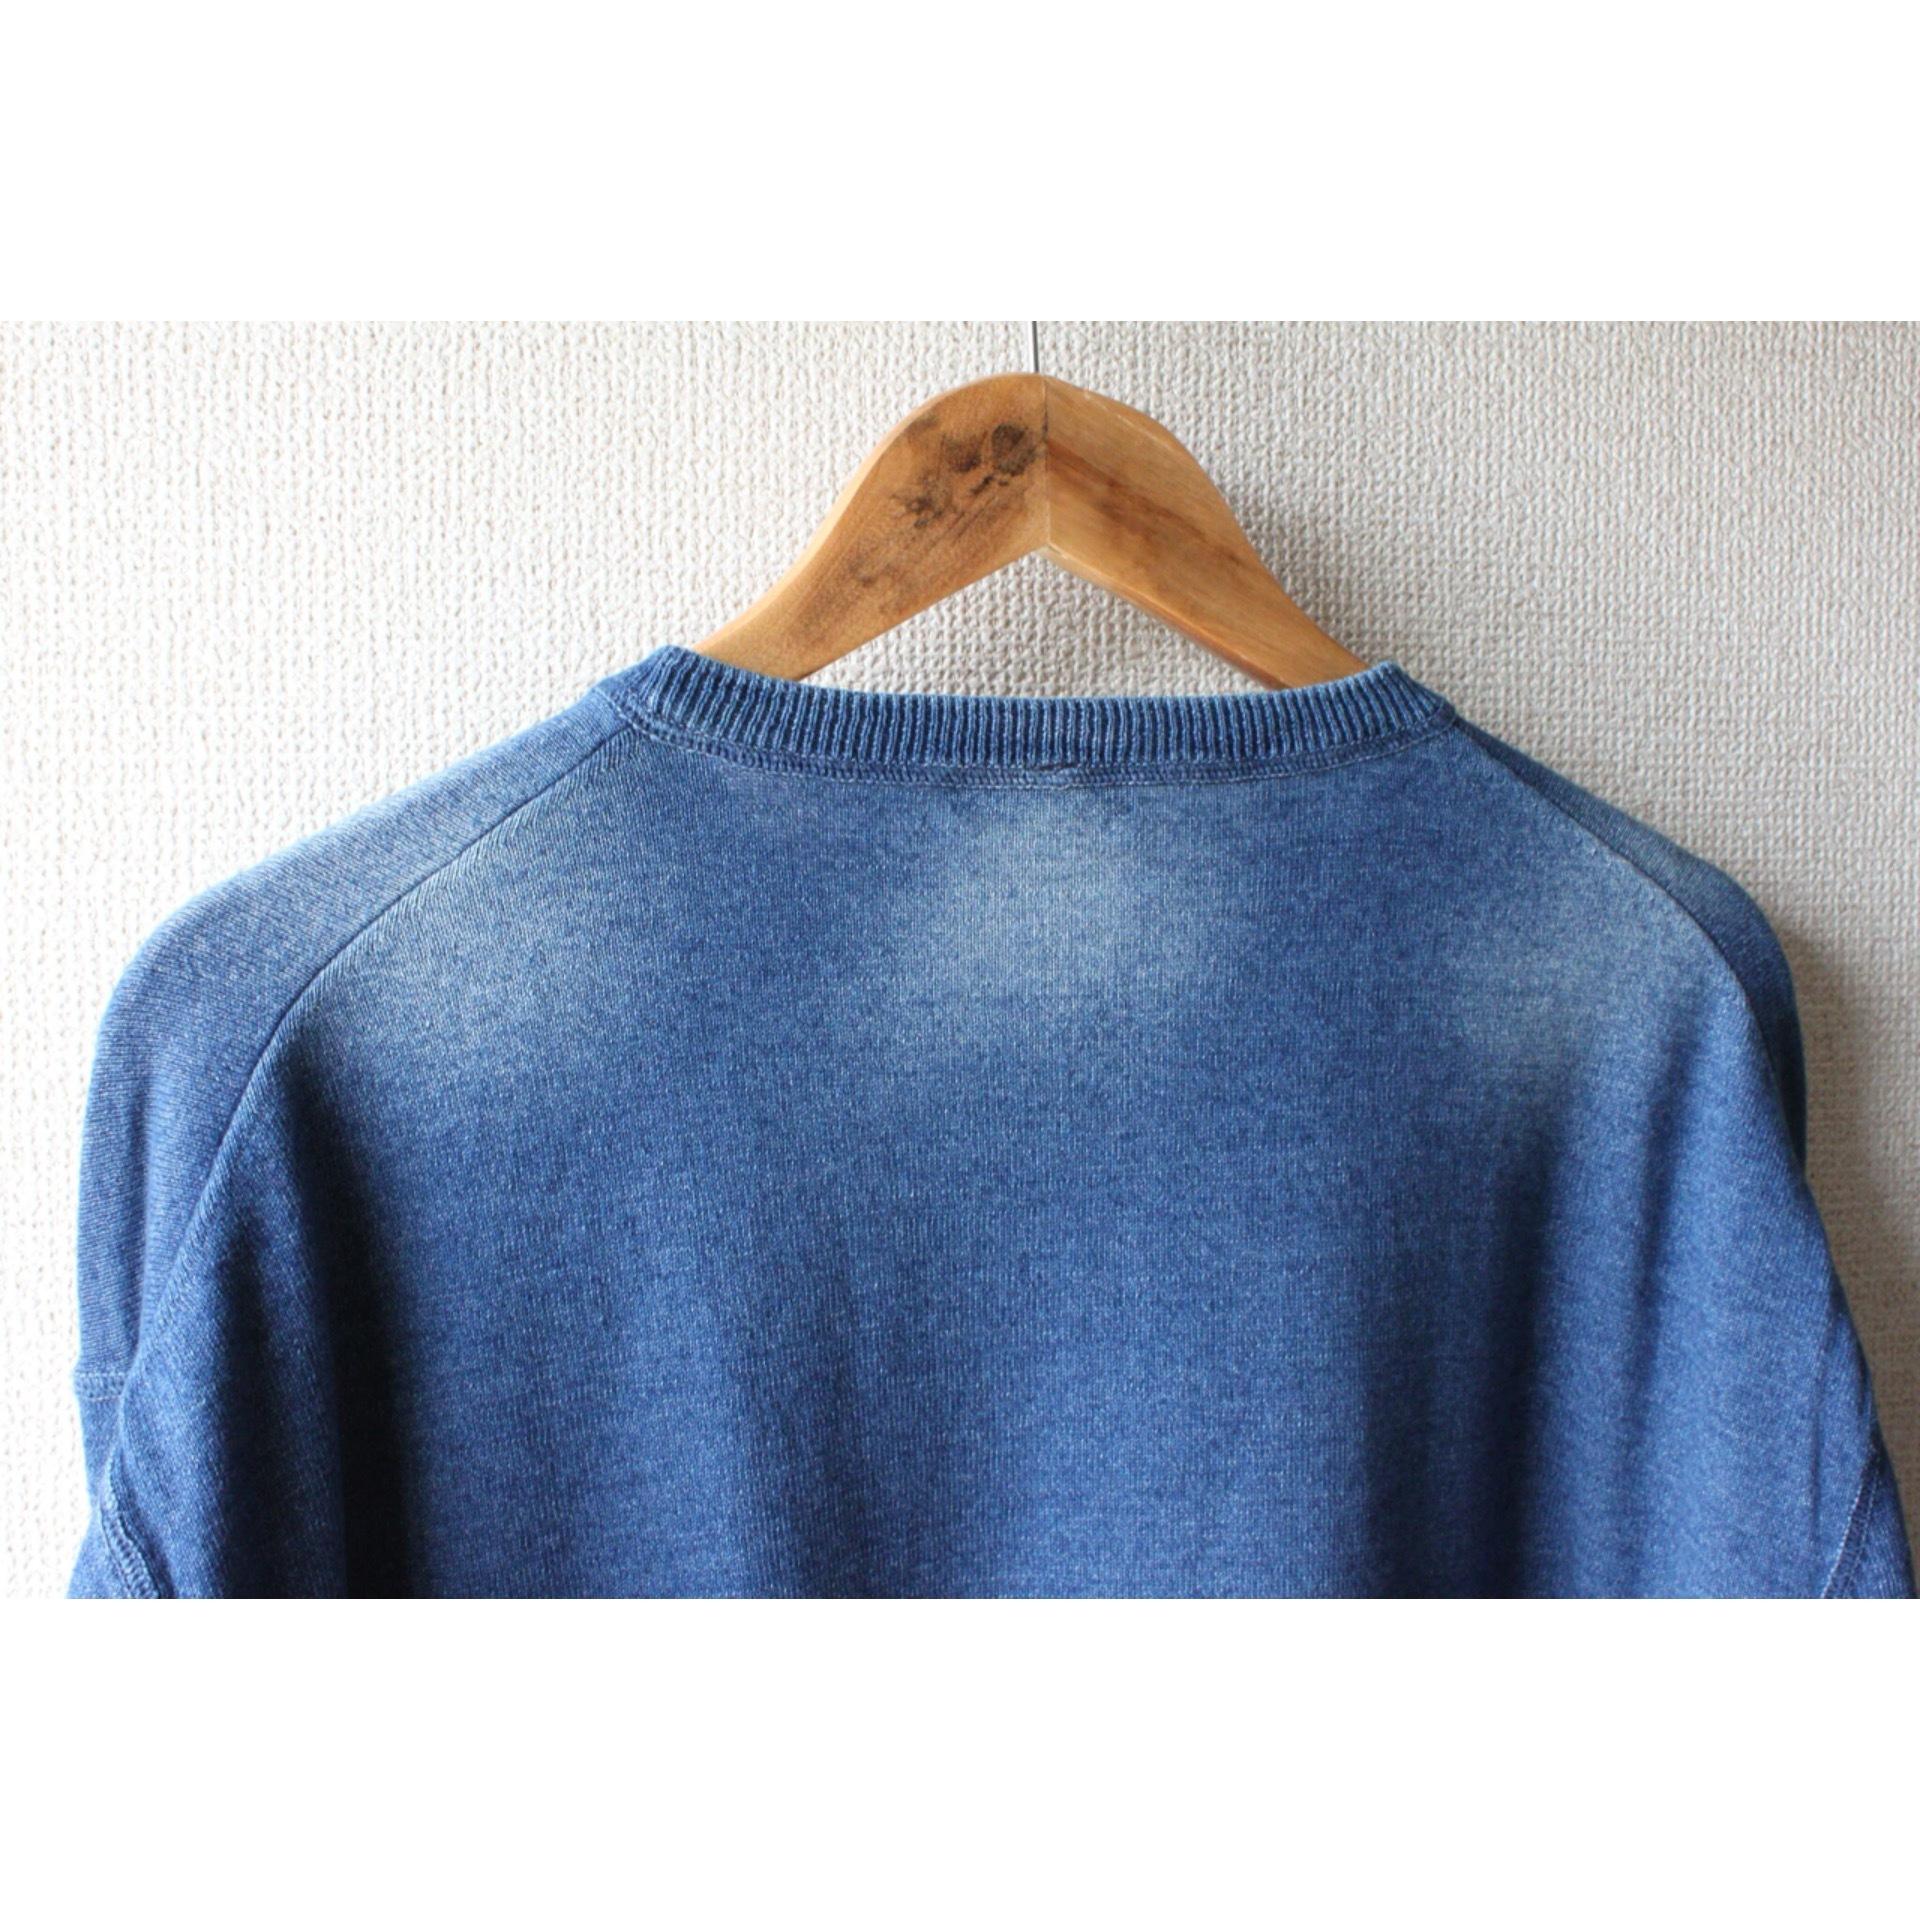 Vintage indigo cut sew